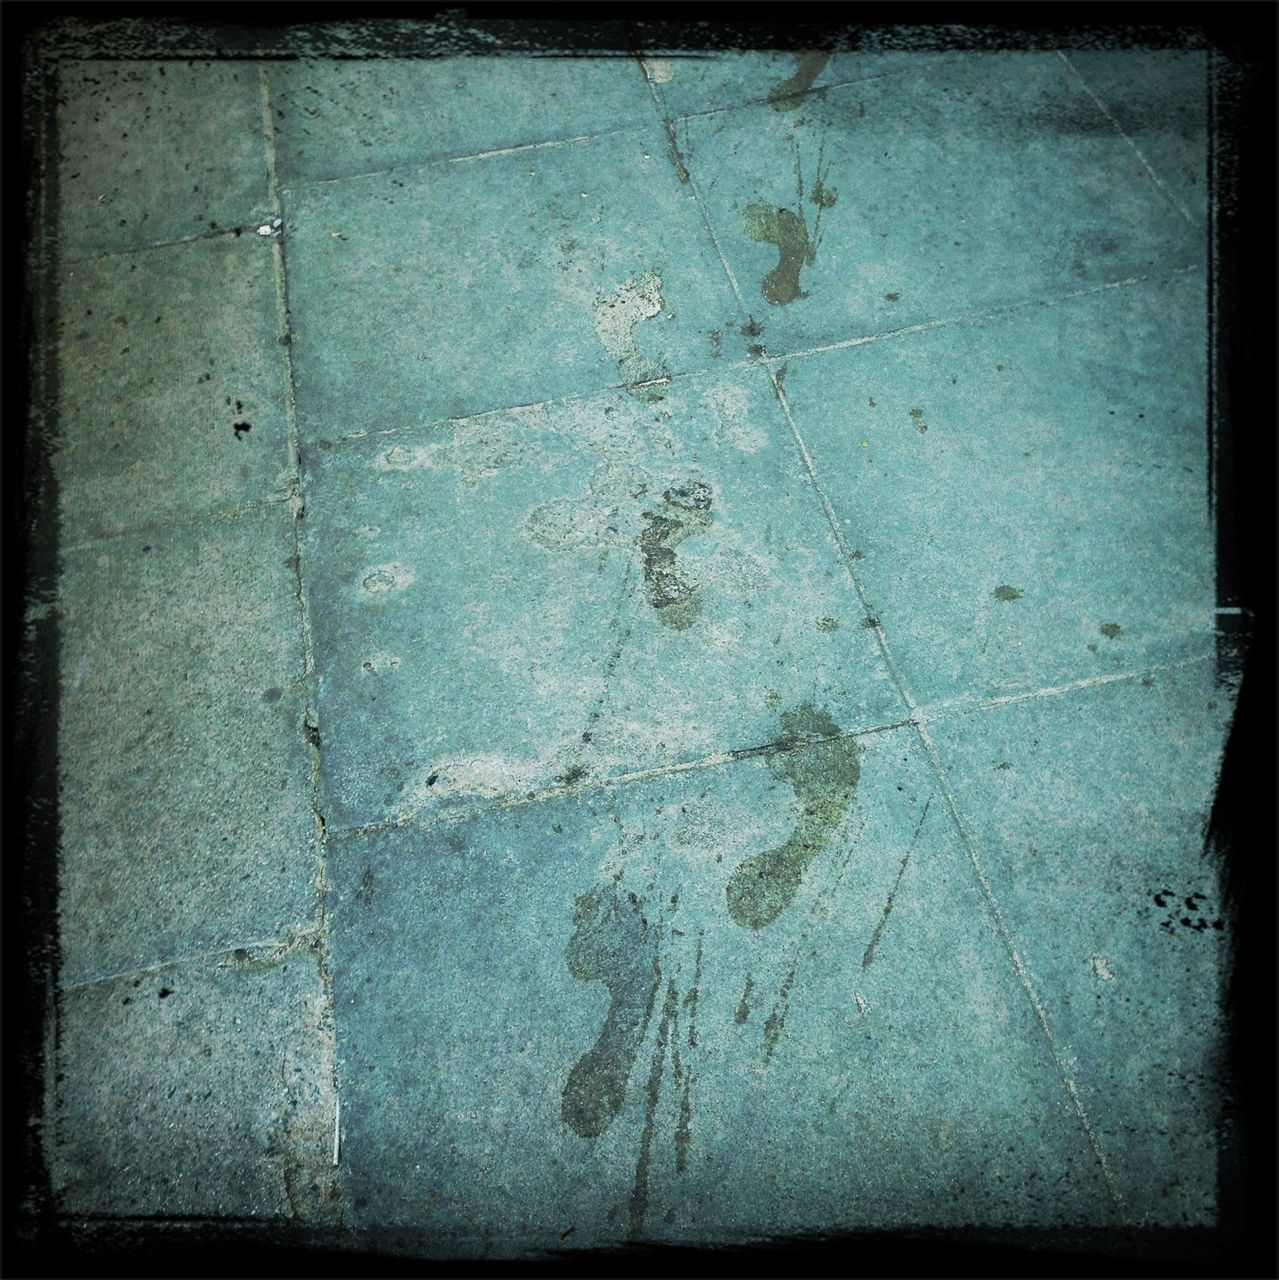 Footprints on tiled floor